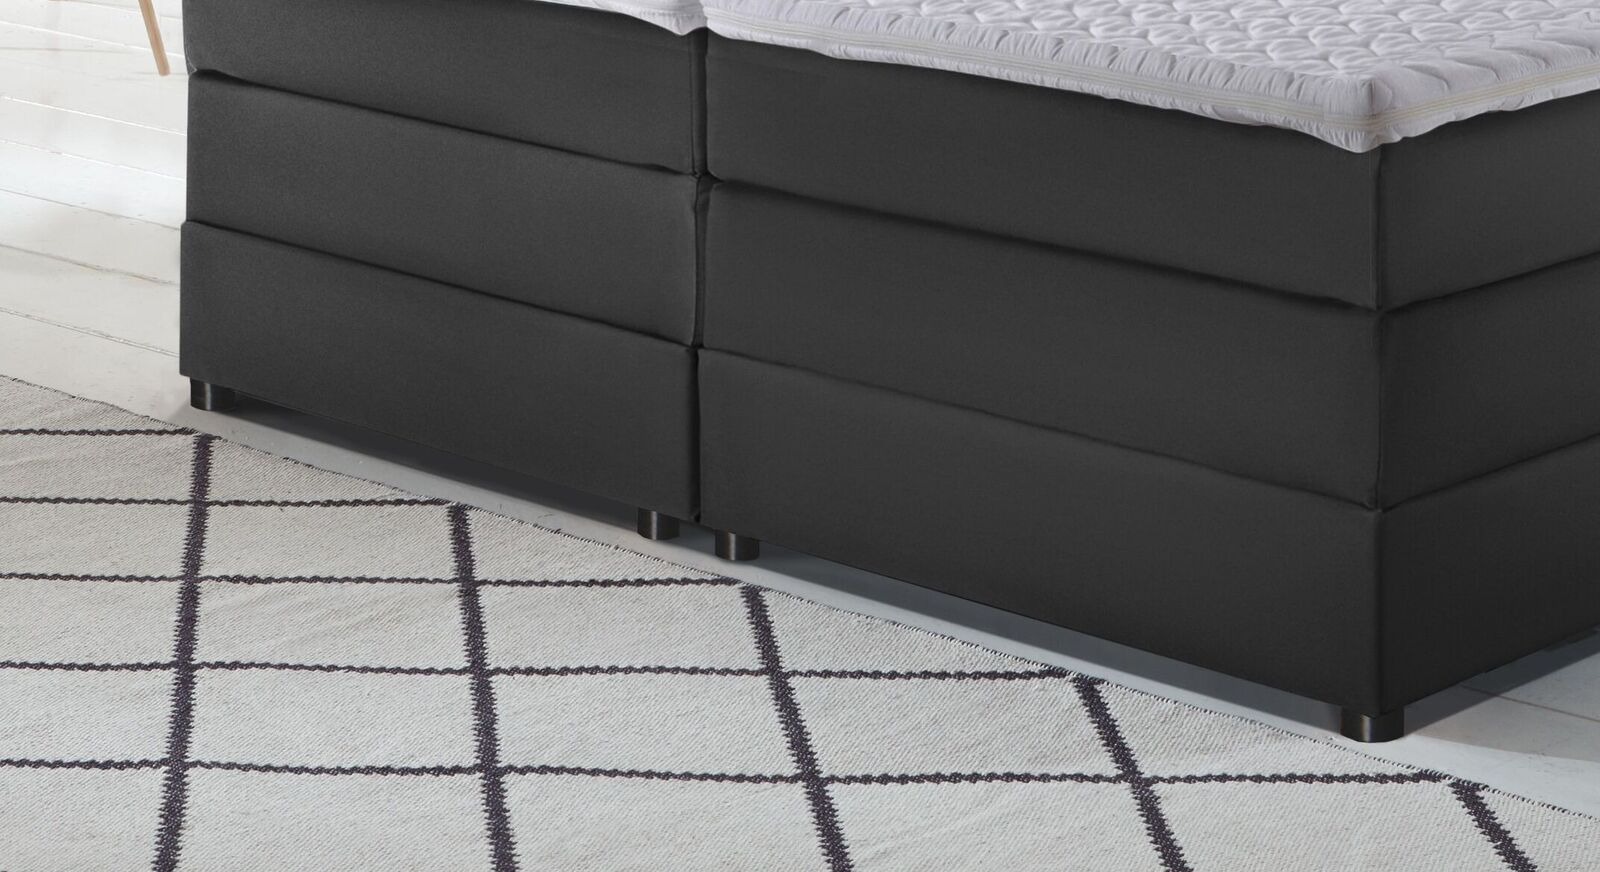 Elektro-Boxspringbett Veroli mit niedrigen Bettbeinen